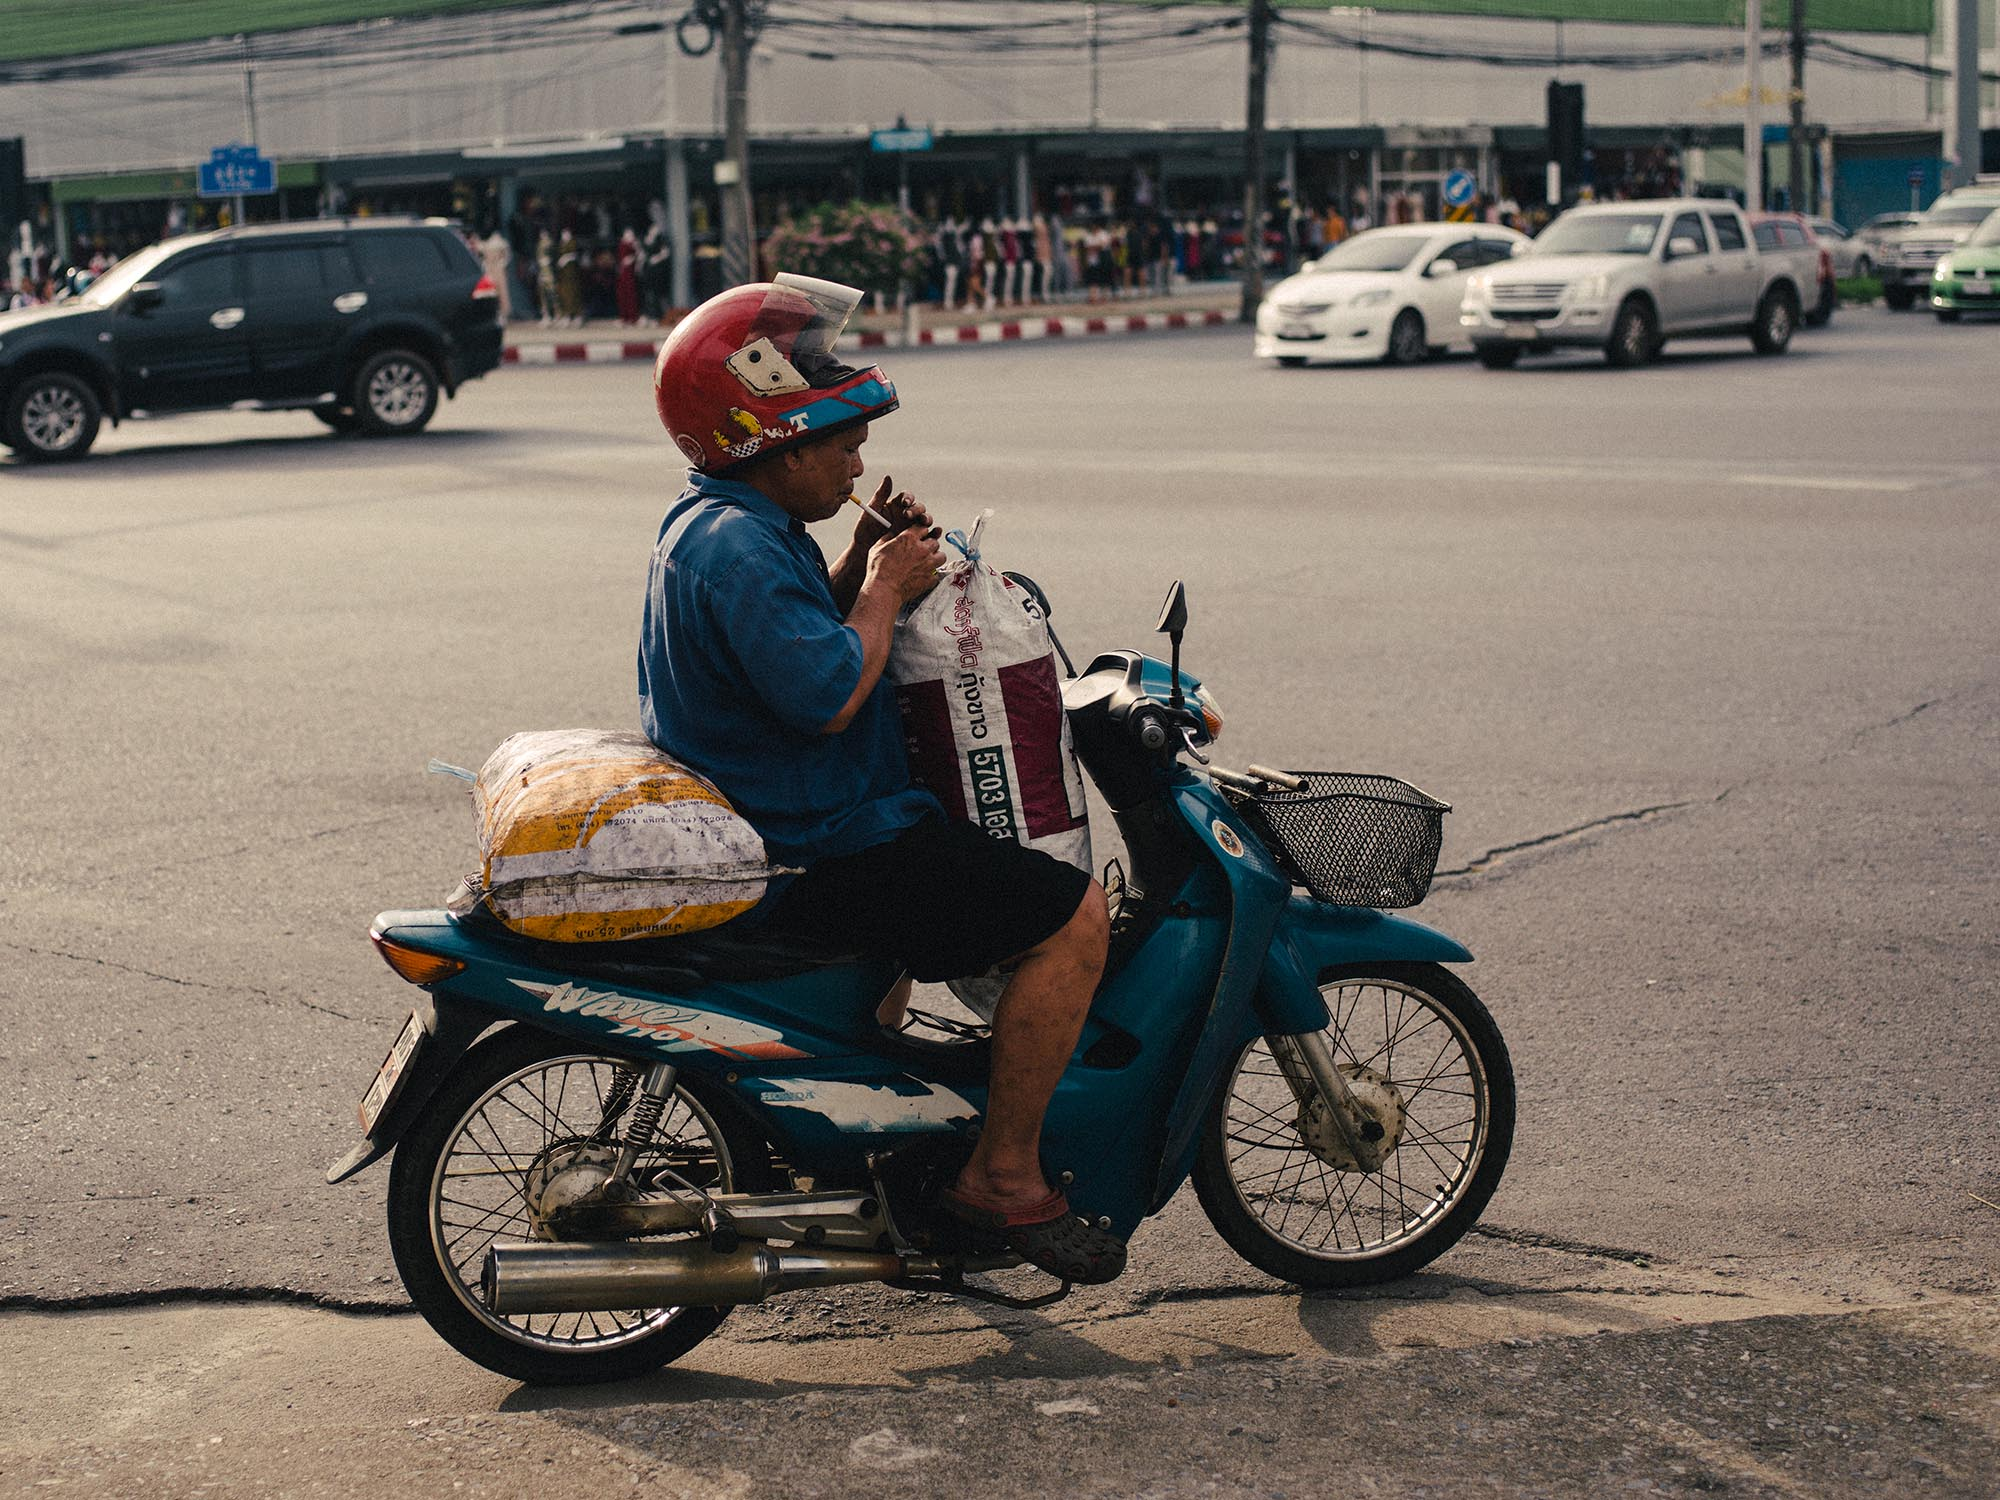 Motorbike smoking.